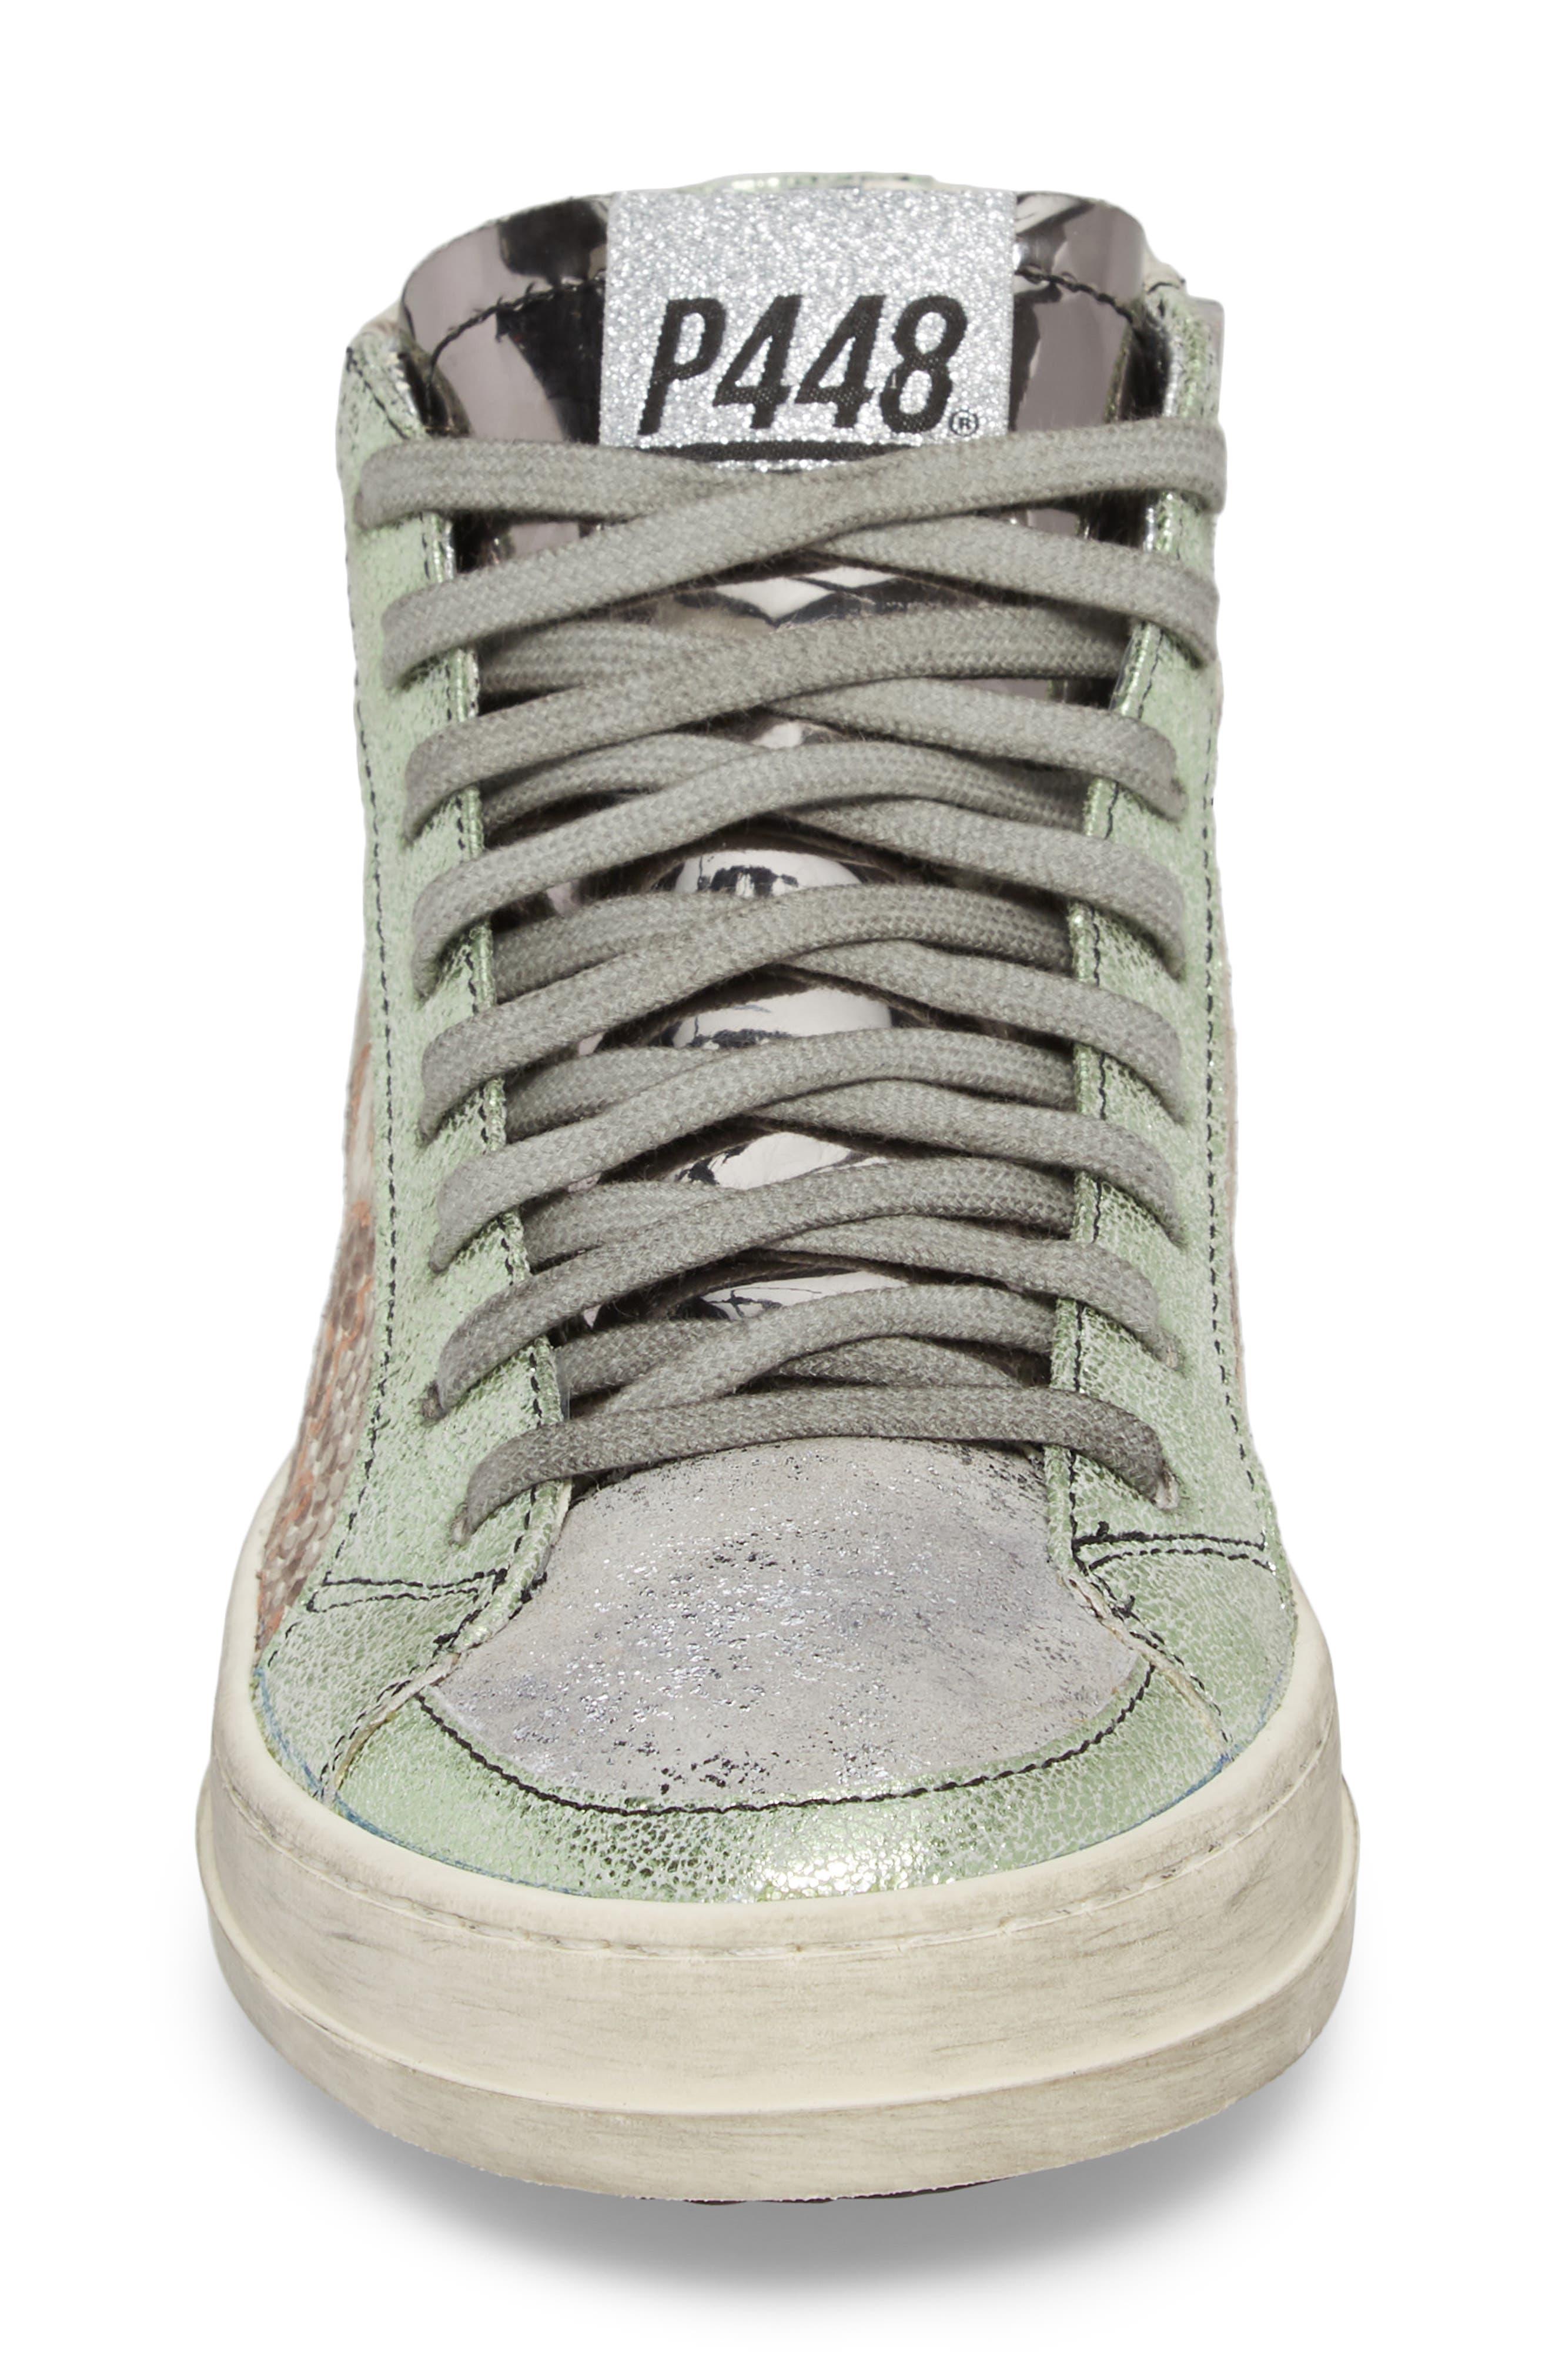 Skate High Top Sneaker,                             Alternate thumbnail 4, color,                             Jacobs Print